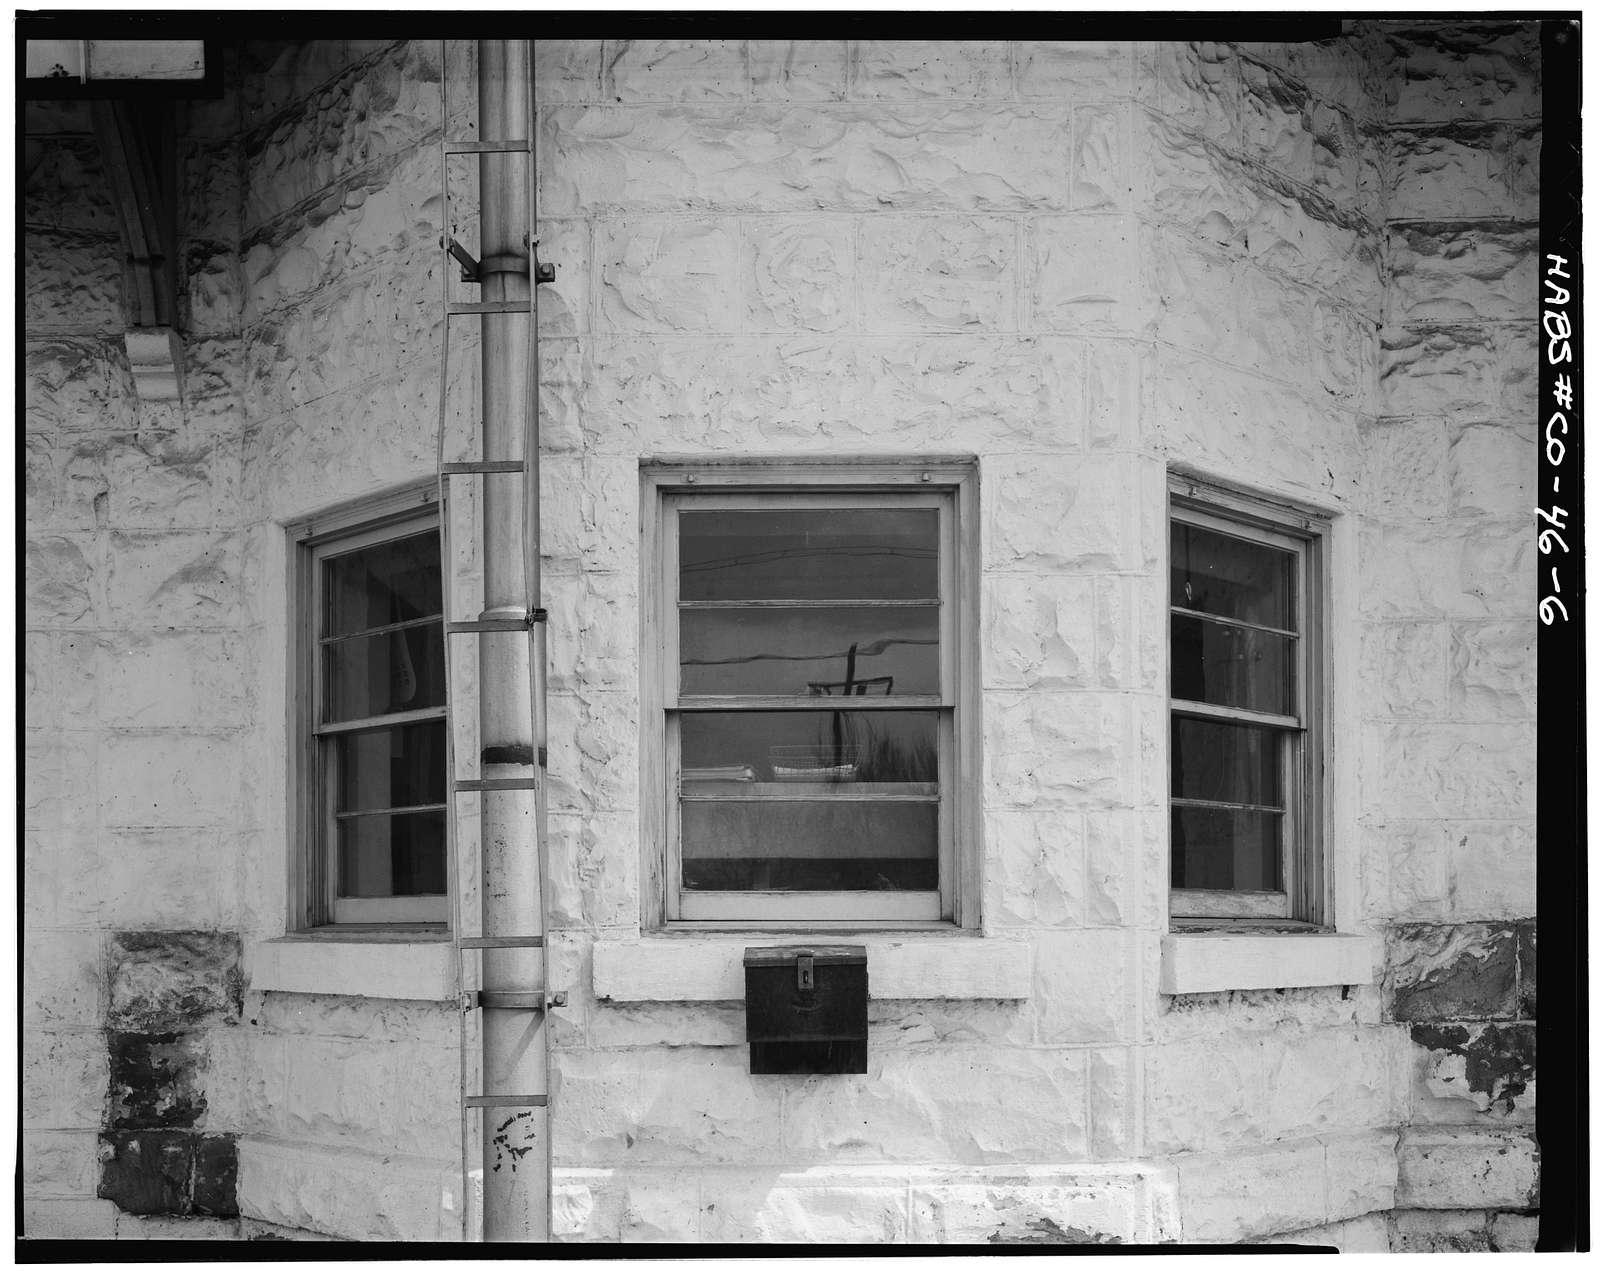 Littleton Denver & Rio Grande Western Depot, 2199 West Littleton Boulevard, Littleton, Arapahoe County, CO